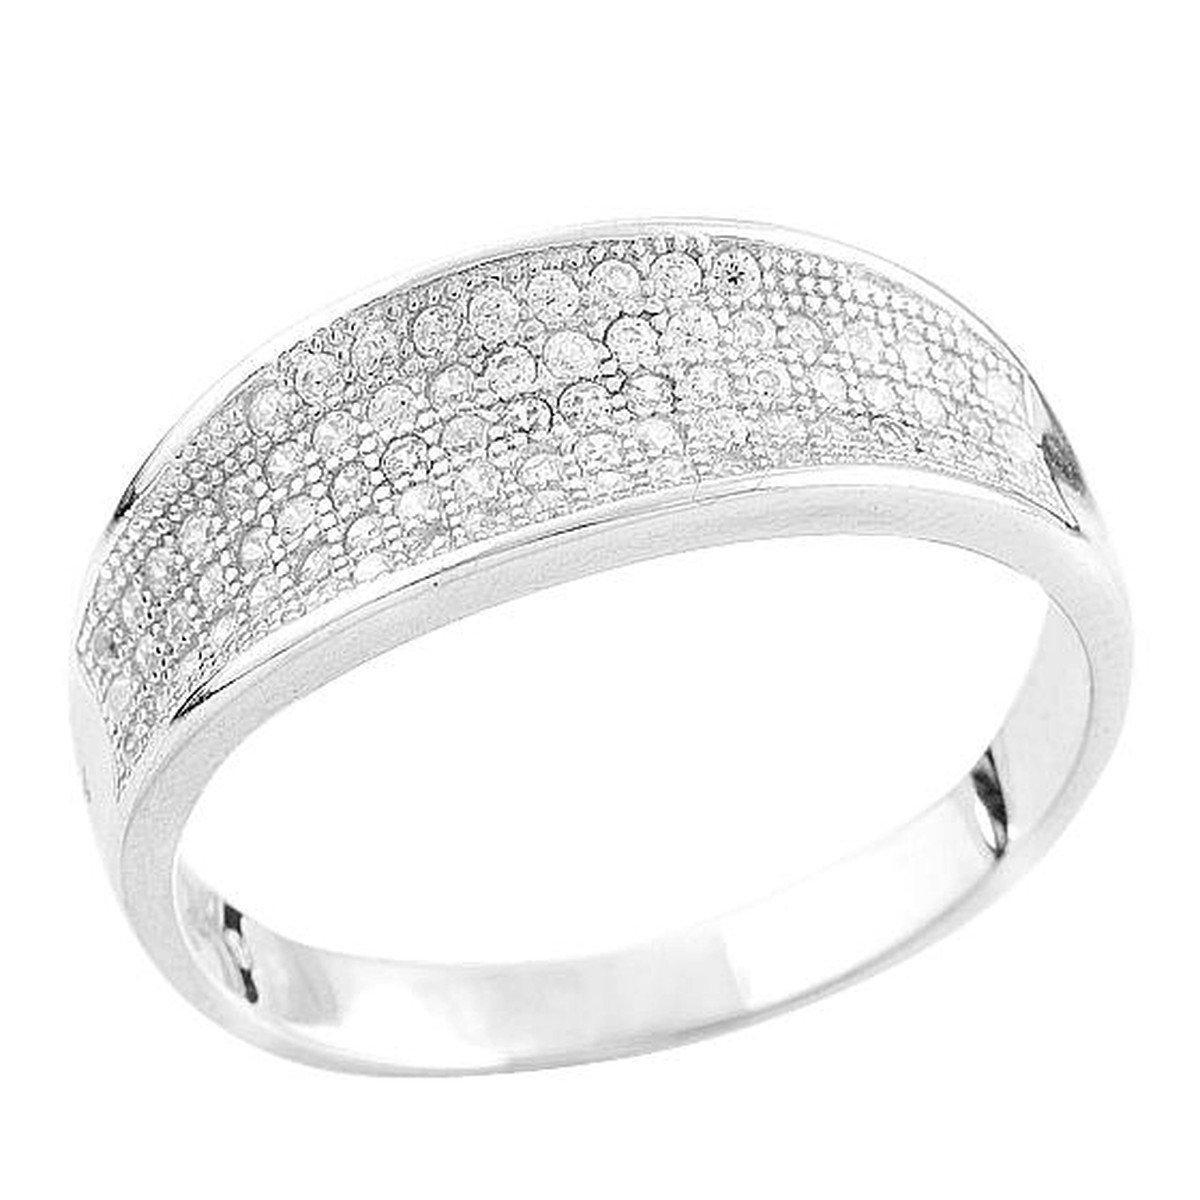 Серебряное кольцо DreamJewelry с фианитами (1560594) 18 размер